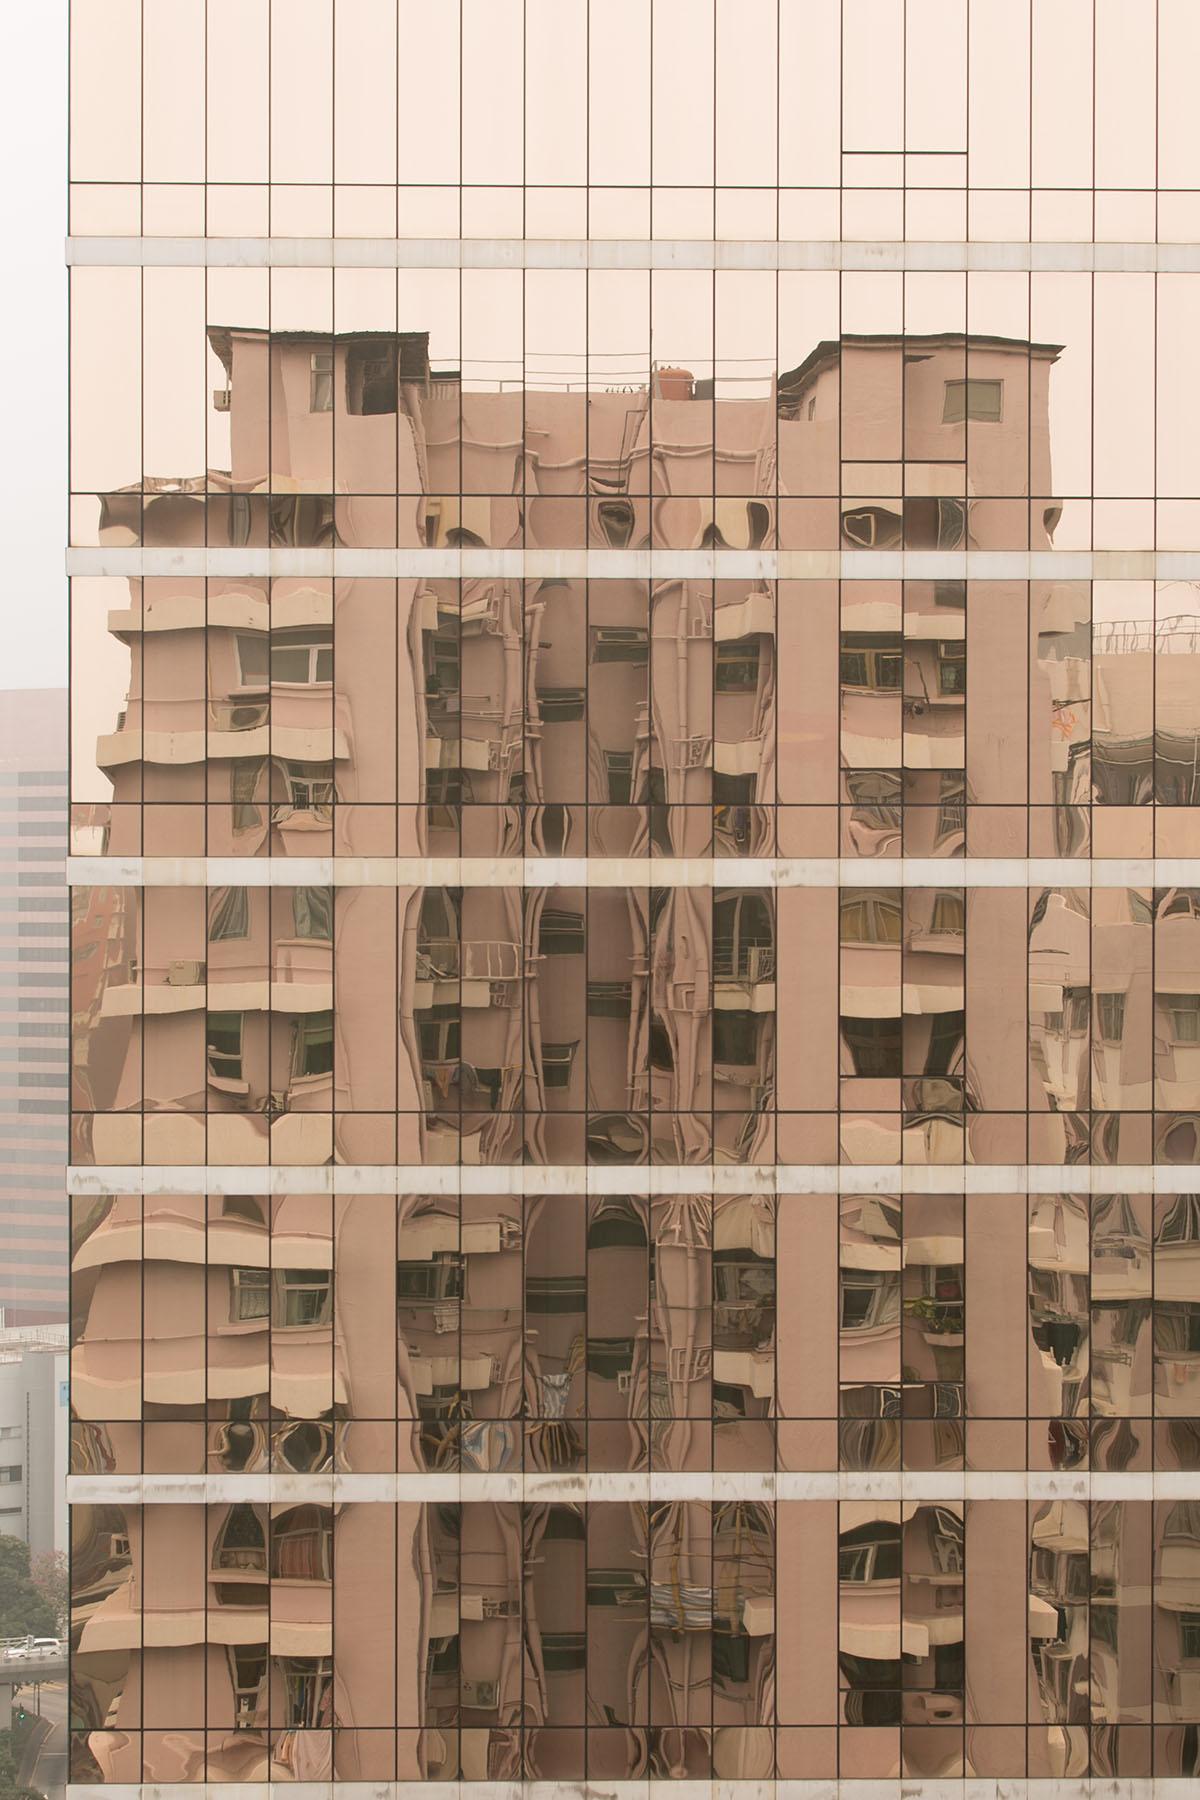 Reflected Building Residential Living Hong Kong.jpg